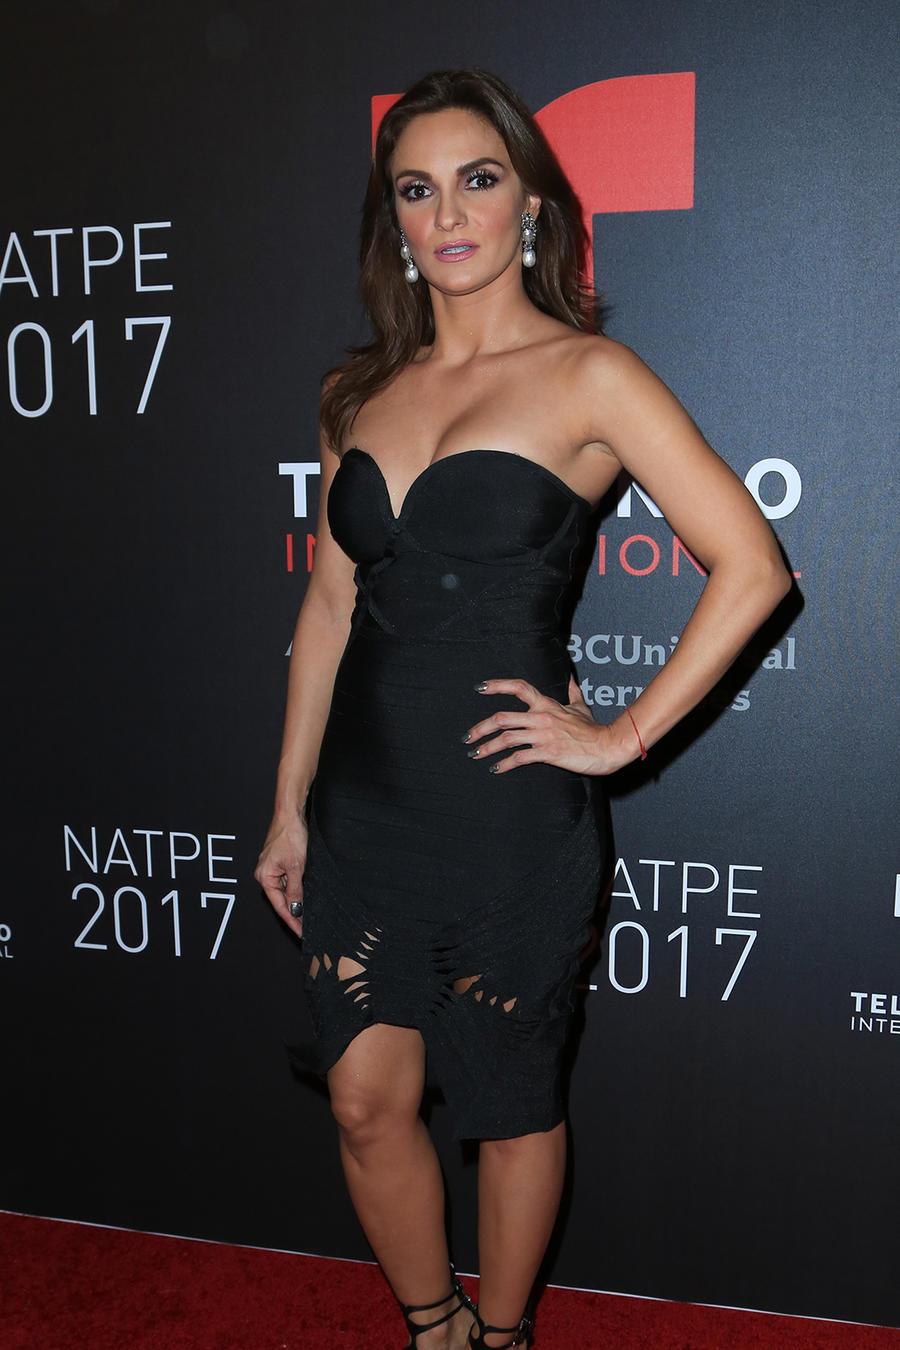 Natpe 2017, Actriz, Mariana Seoane